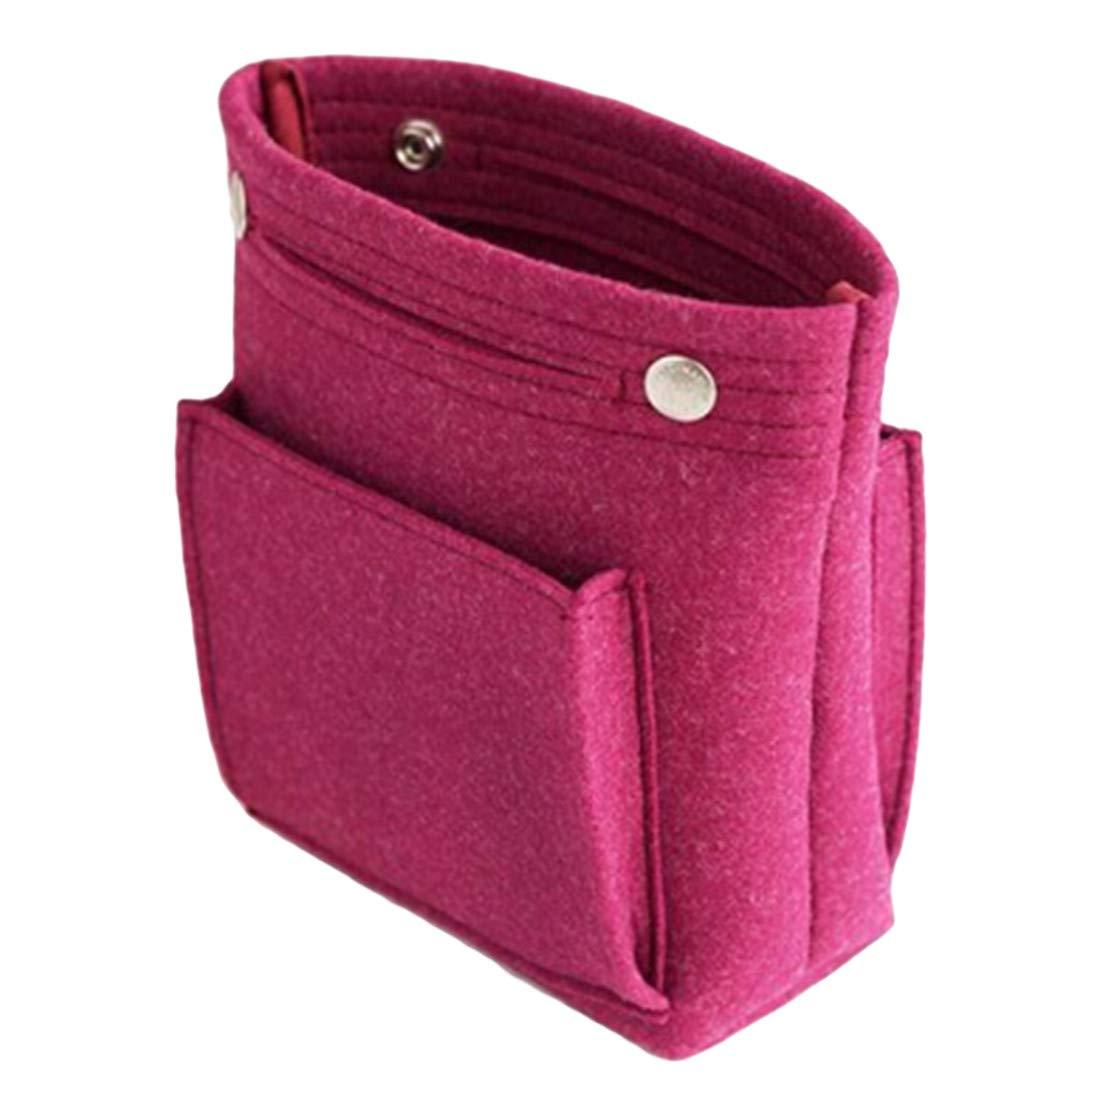 UINKE Portable Felt Purse Insert Makeup Handbag Organizer Travel Cosmetic Bag for Women Girls,Purple